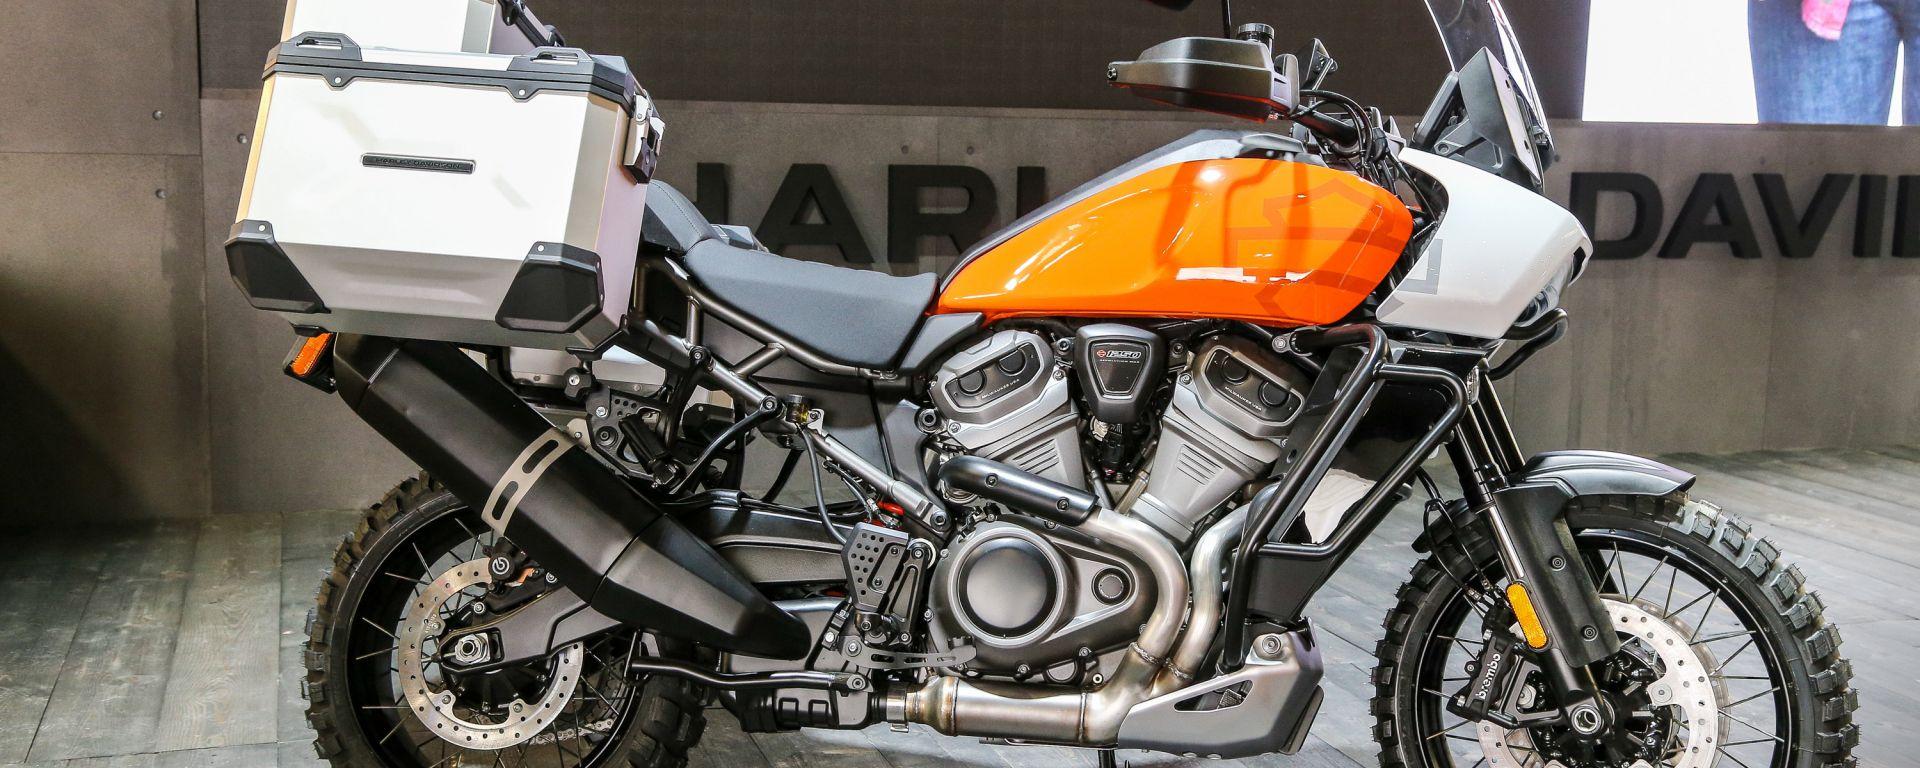 Harley-Davidson: slitta l'arrivo di Pan America e Bronx